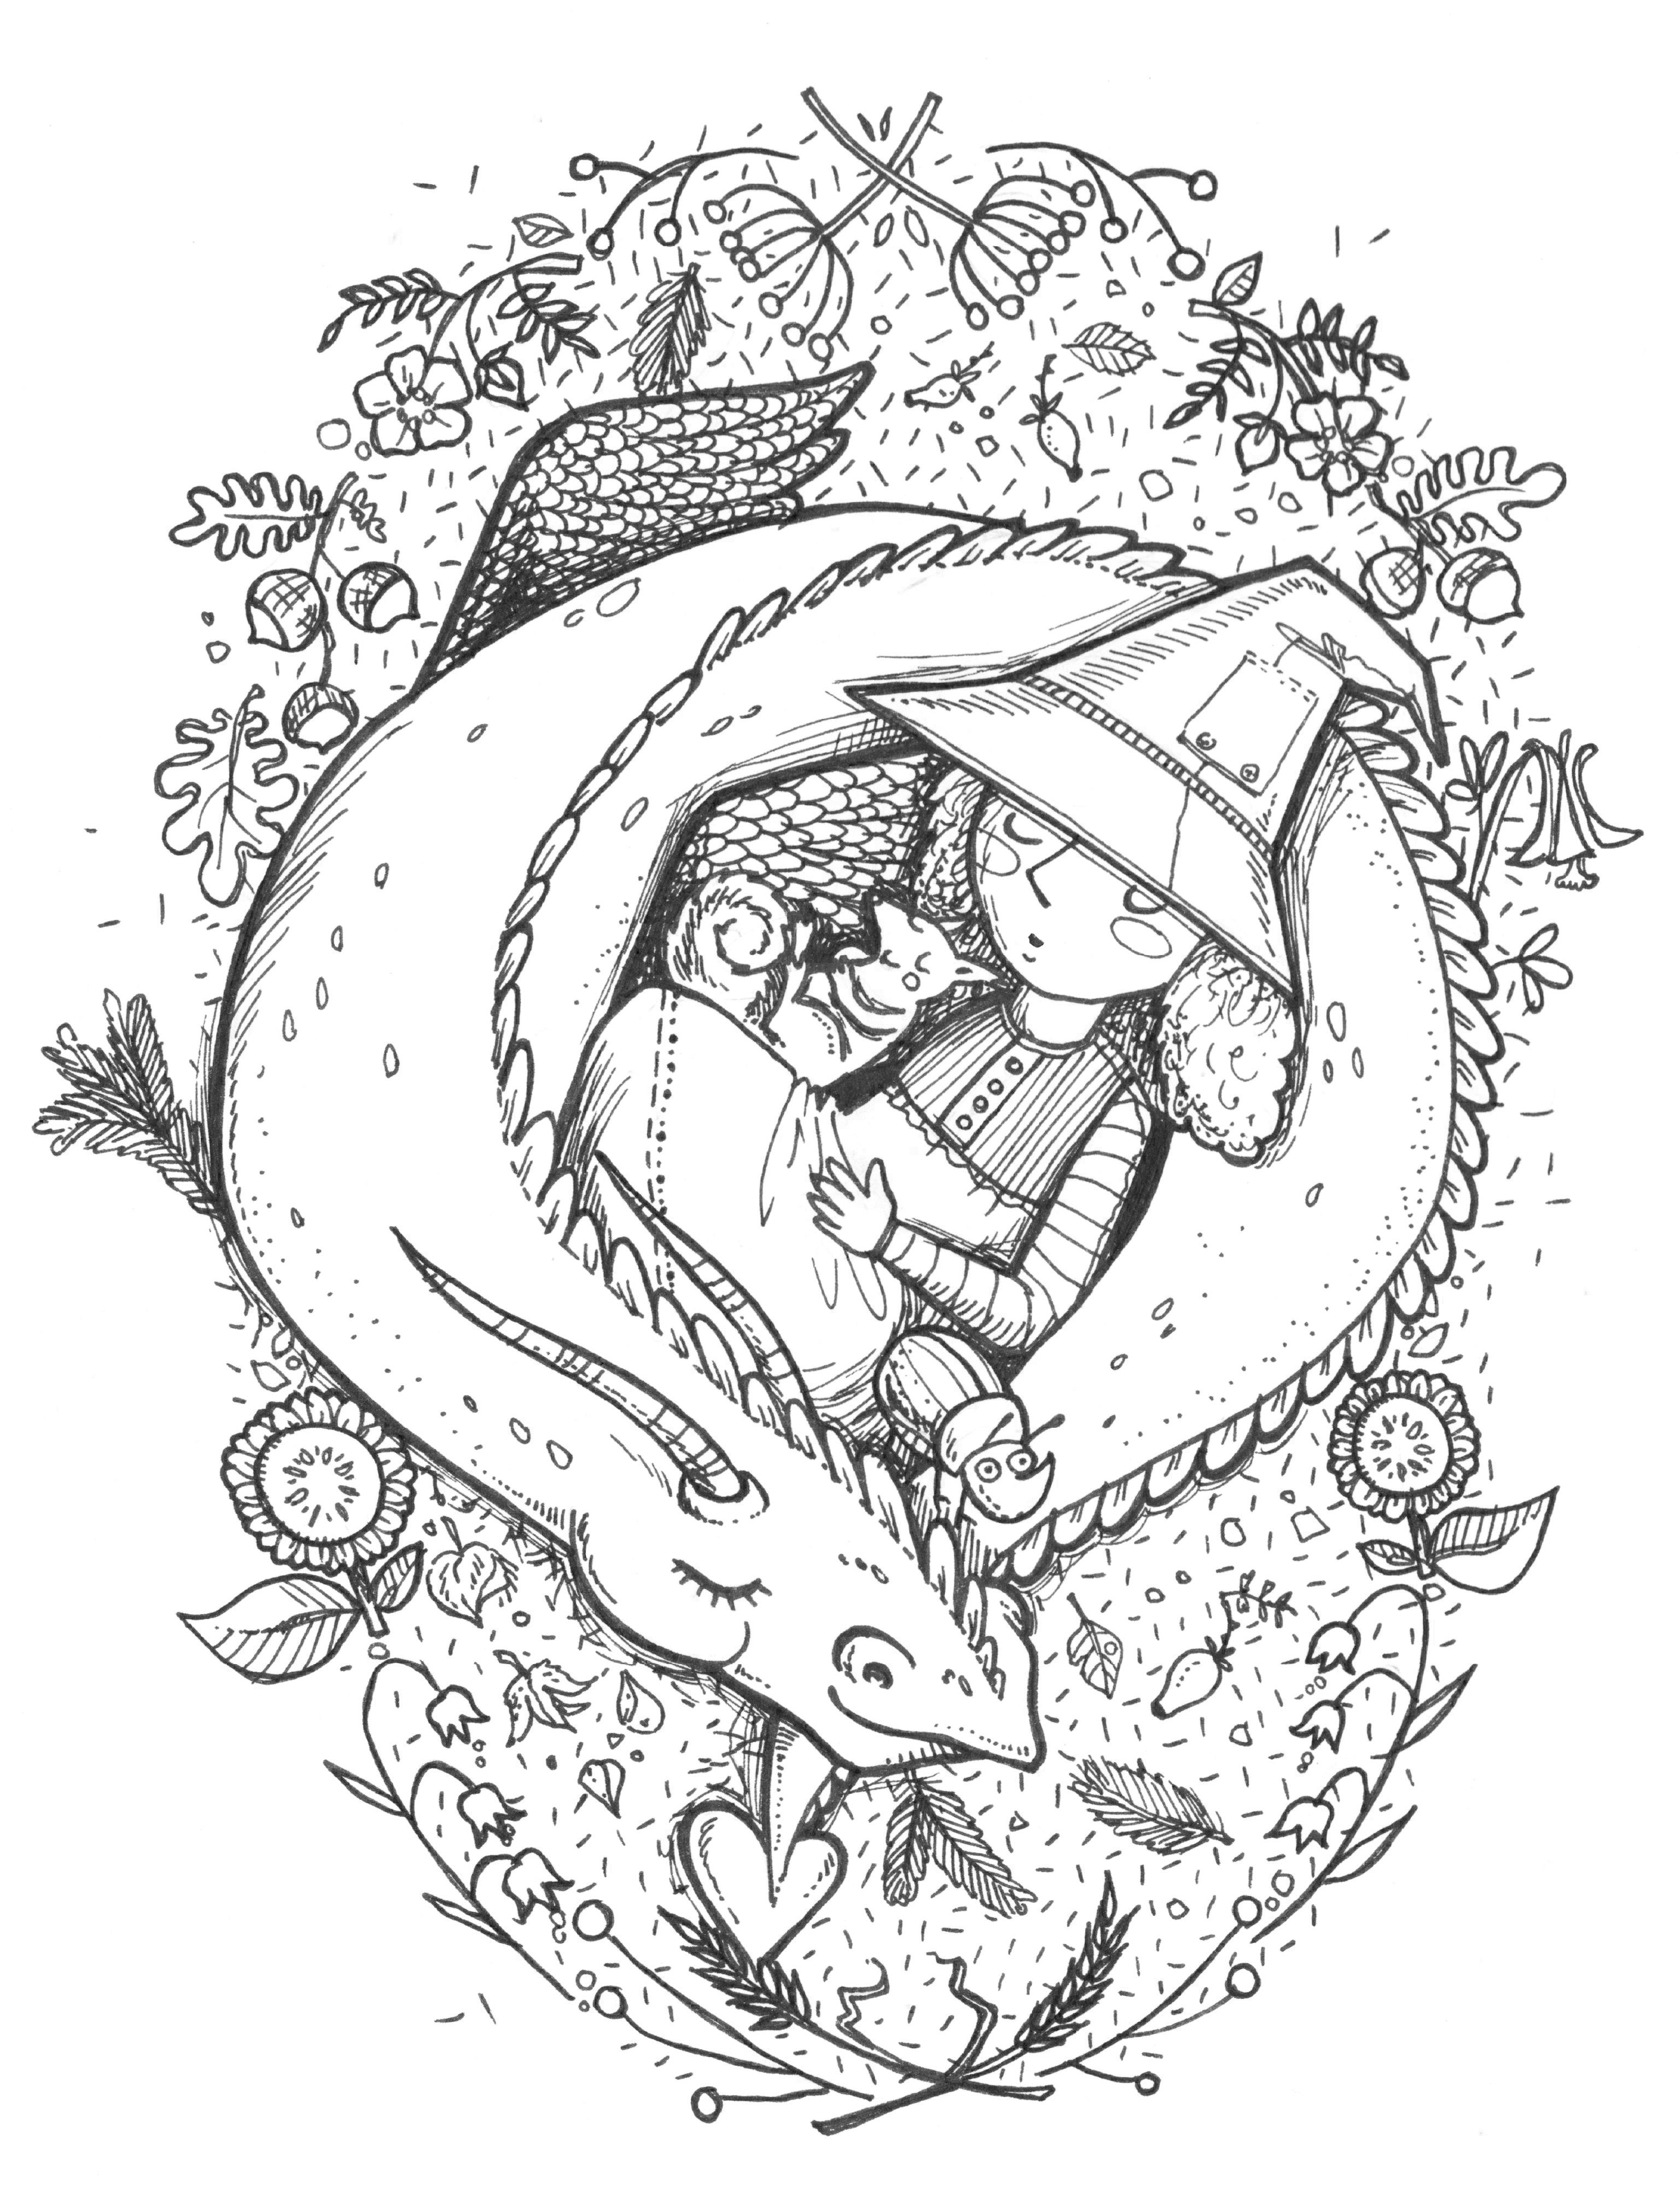 Tusche, Tuscheillustration, Simone Rose Illustration, Kinderbuch, Kinder, Kinderbuchillustration, Illustratorin, Hexe, Drache